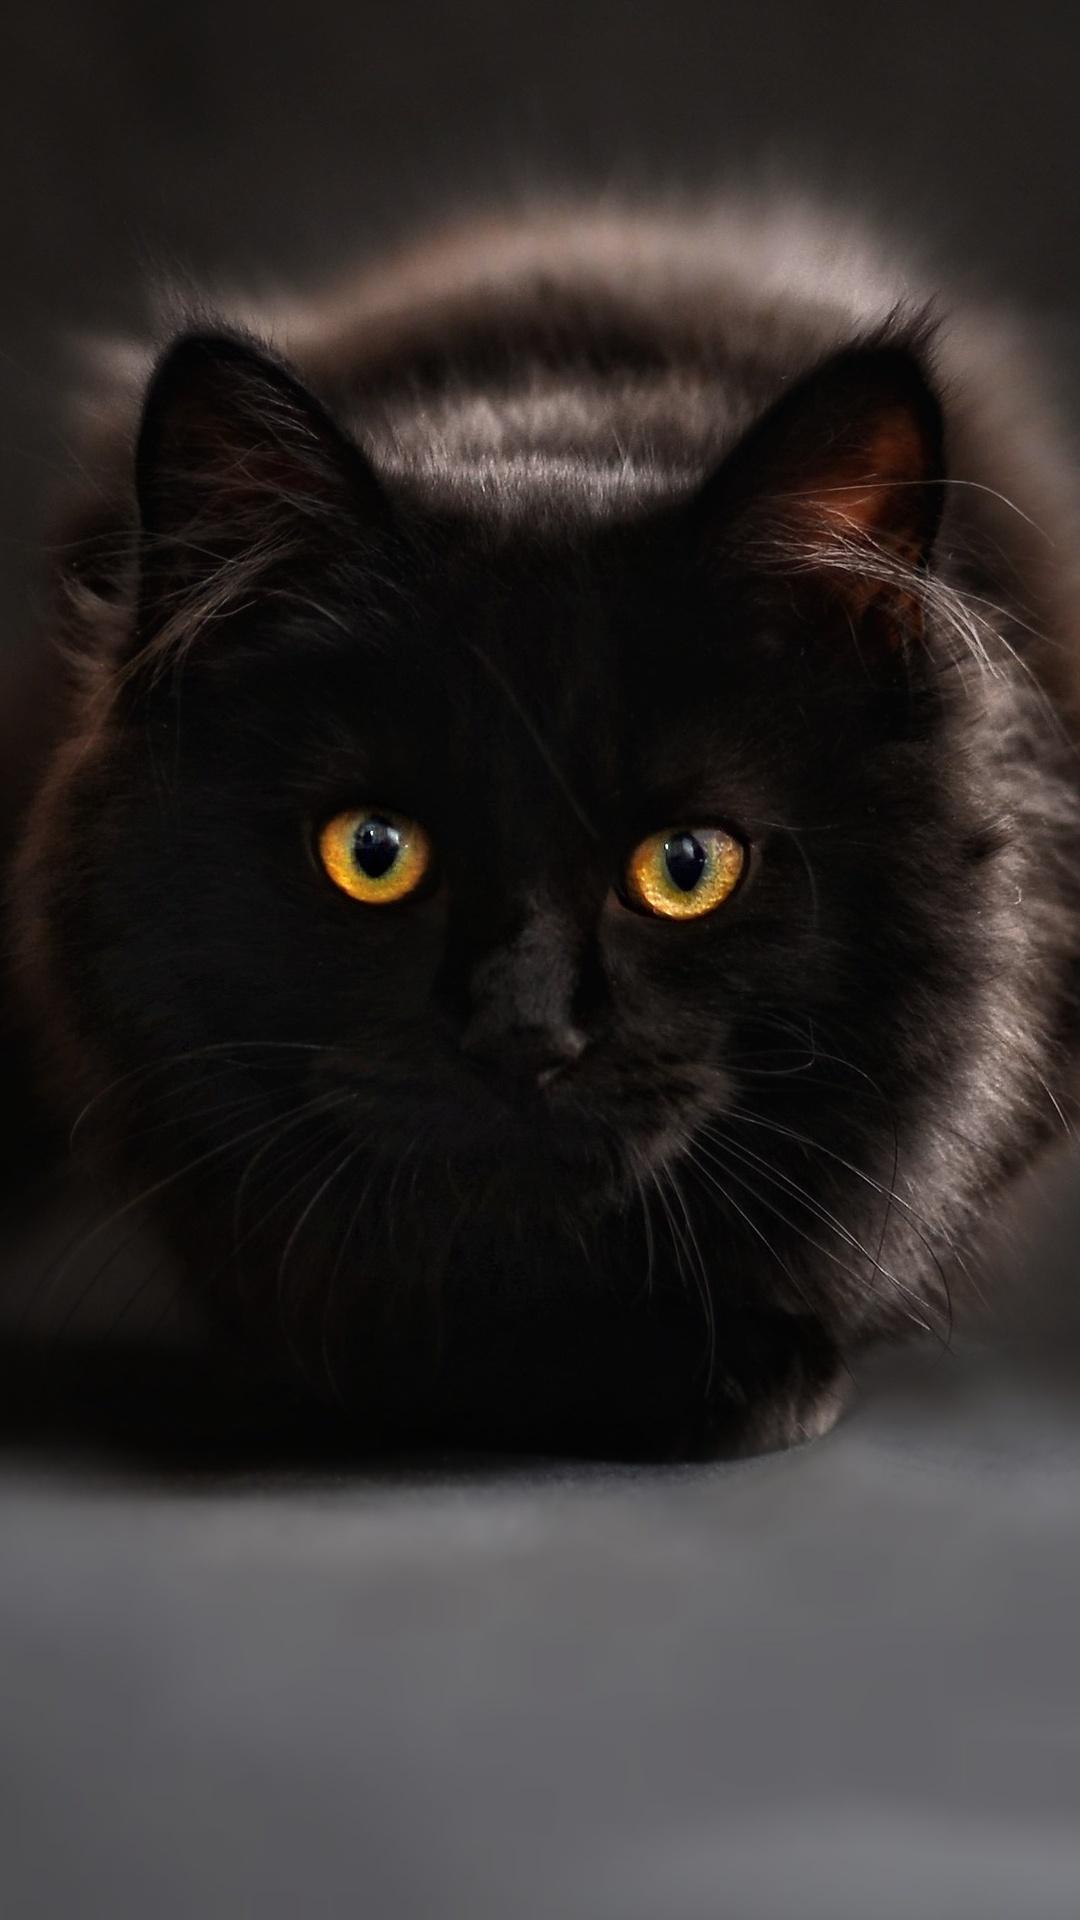 1080x1920 Black Cat Glowing Eyes 4k Iphone 7 6s 6 Plus Pixel Xl